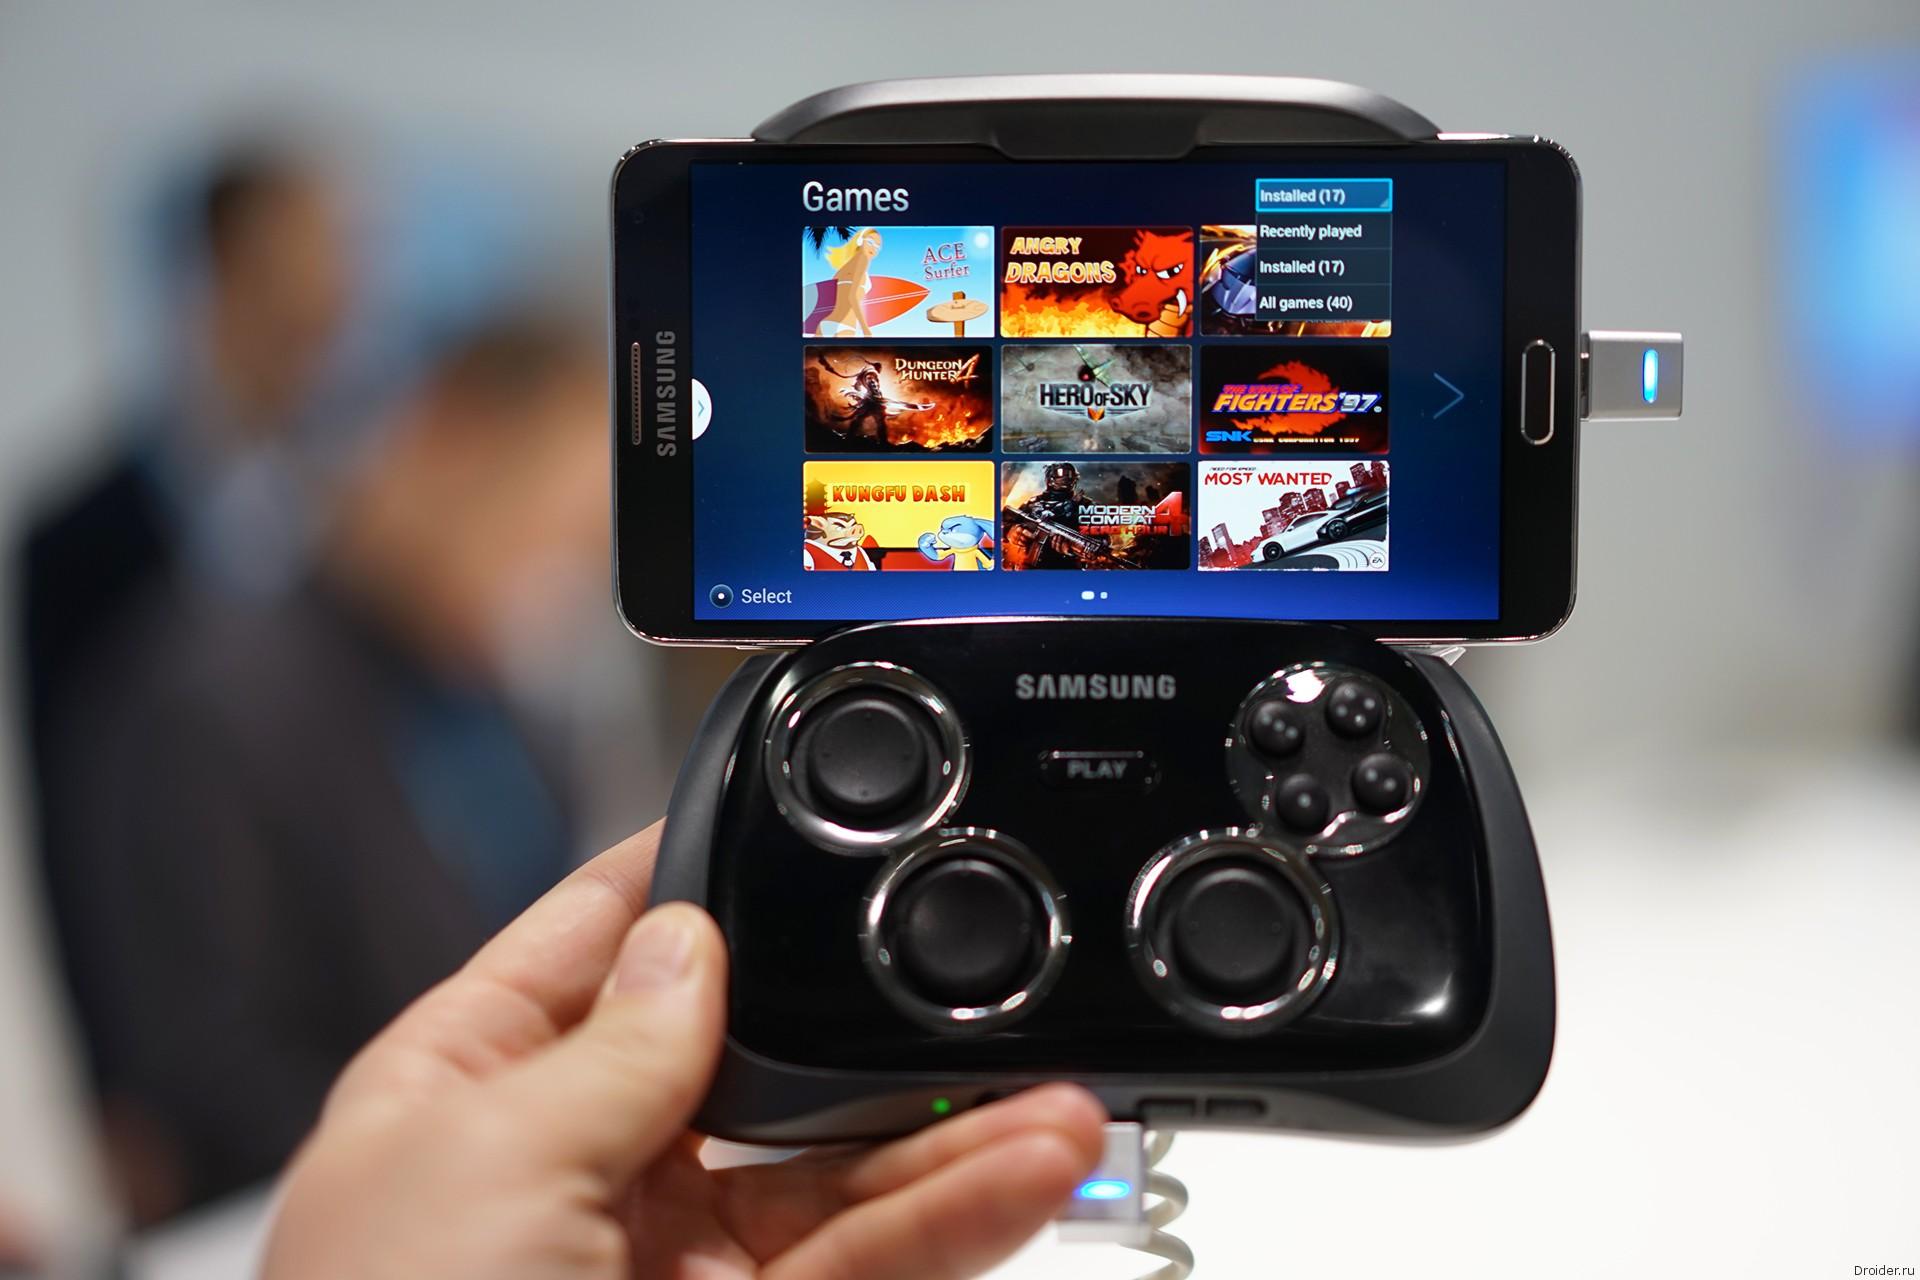 Samsung Smartpnone GamePad